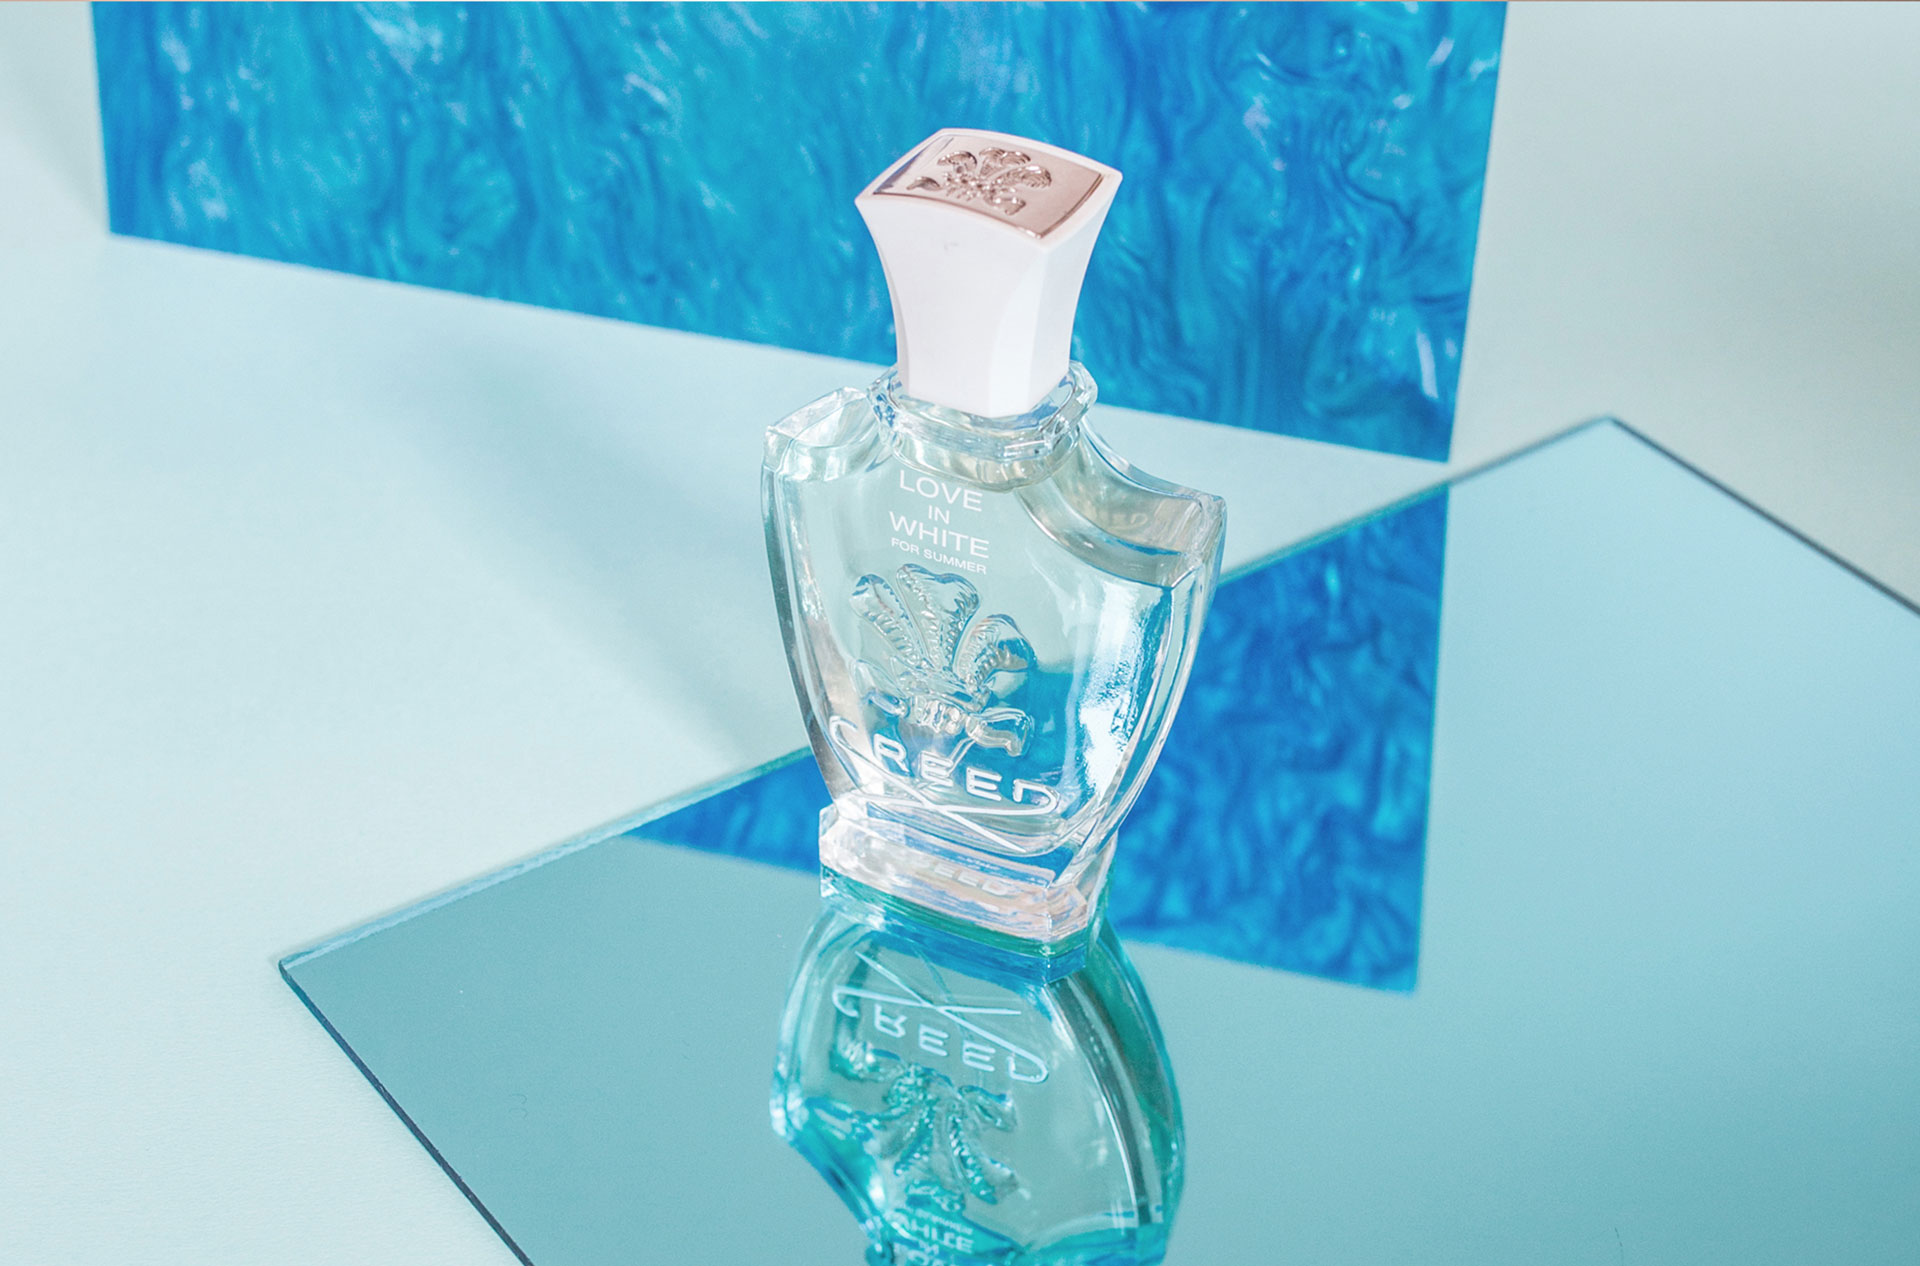 creed love in white for summer new fragrances. Black Bedroom Furniture Sets. Home Design Ideas